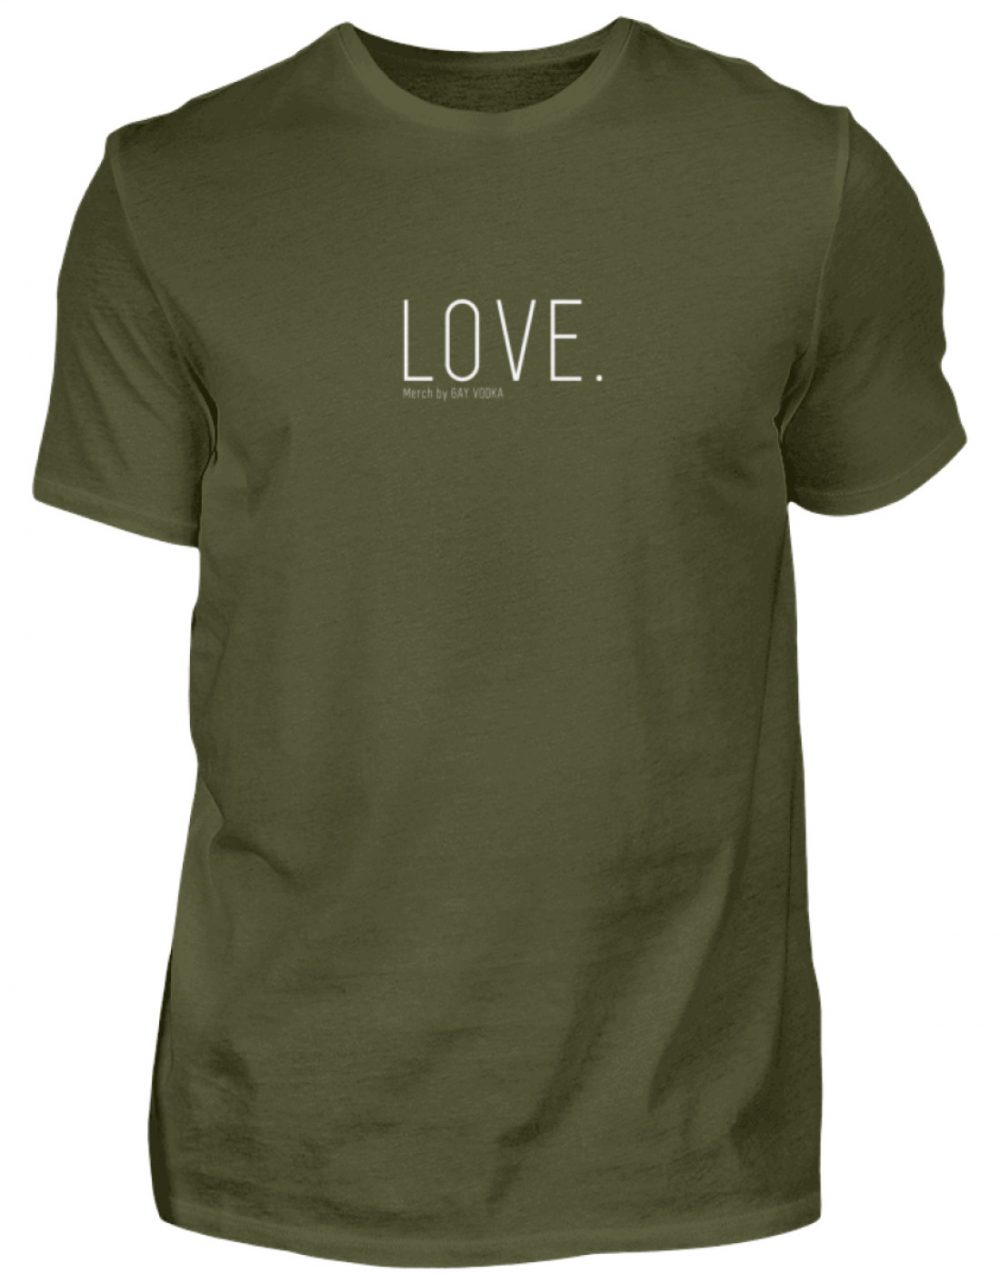 LOVE. - Herren Shirt-1109